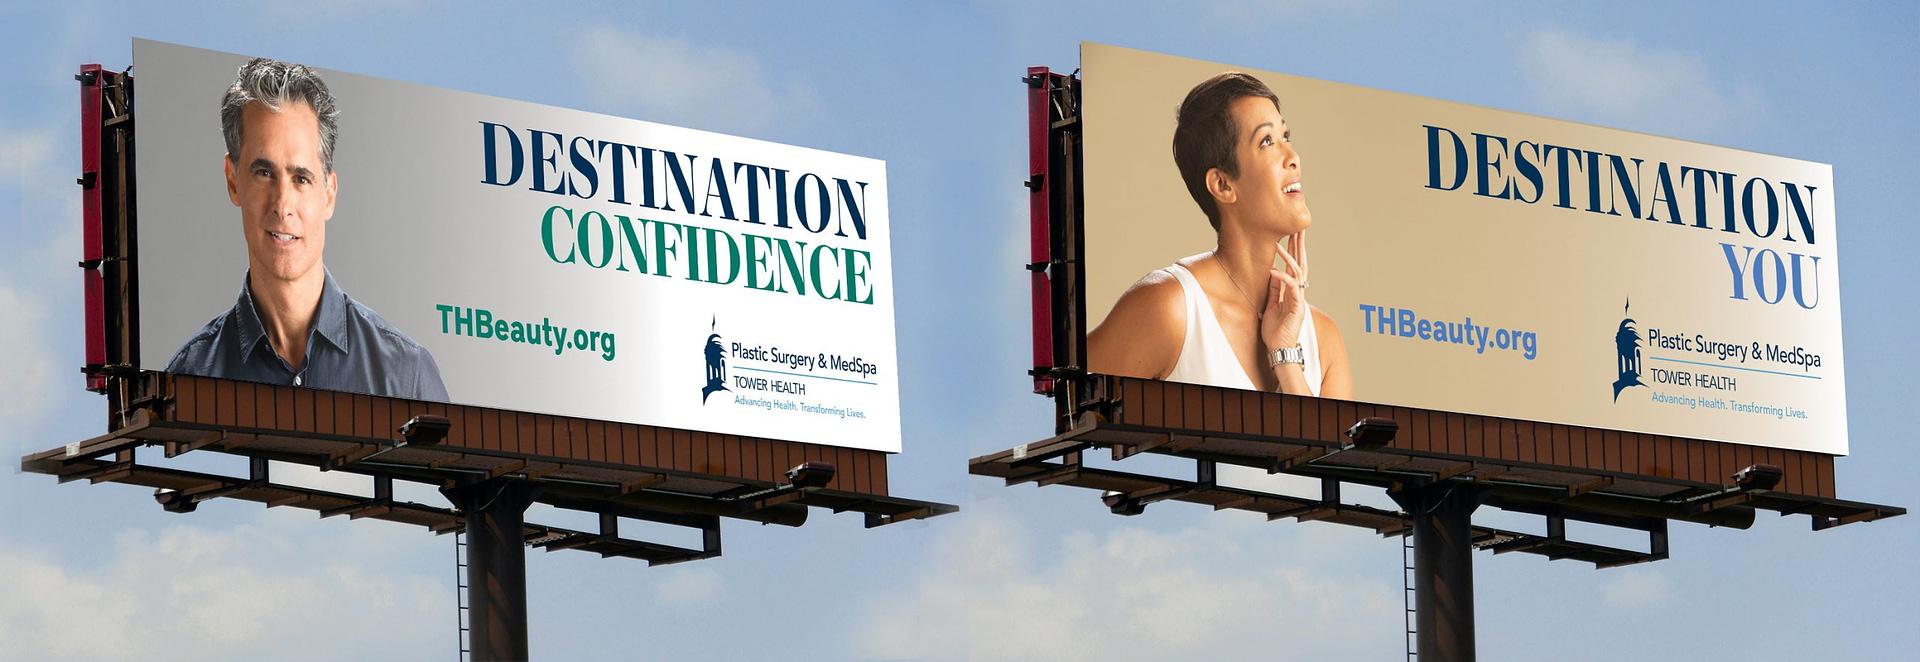 billboard_revised